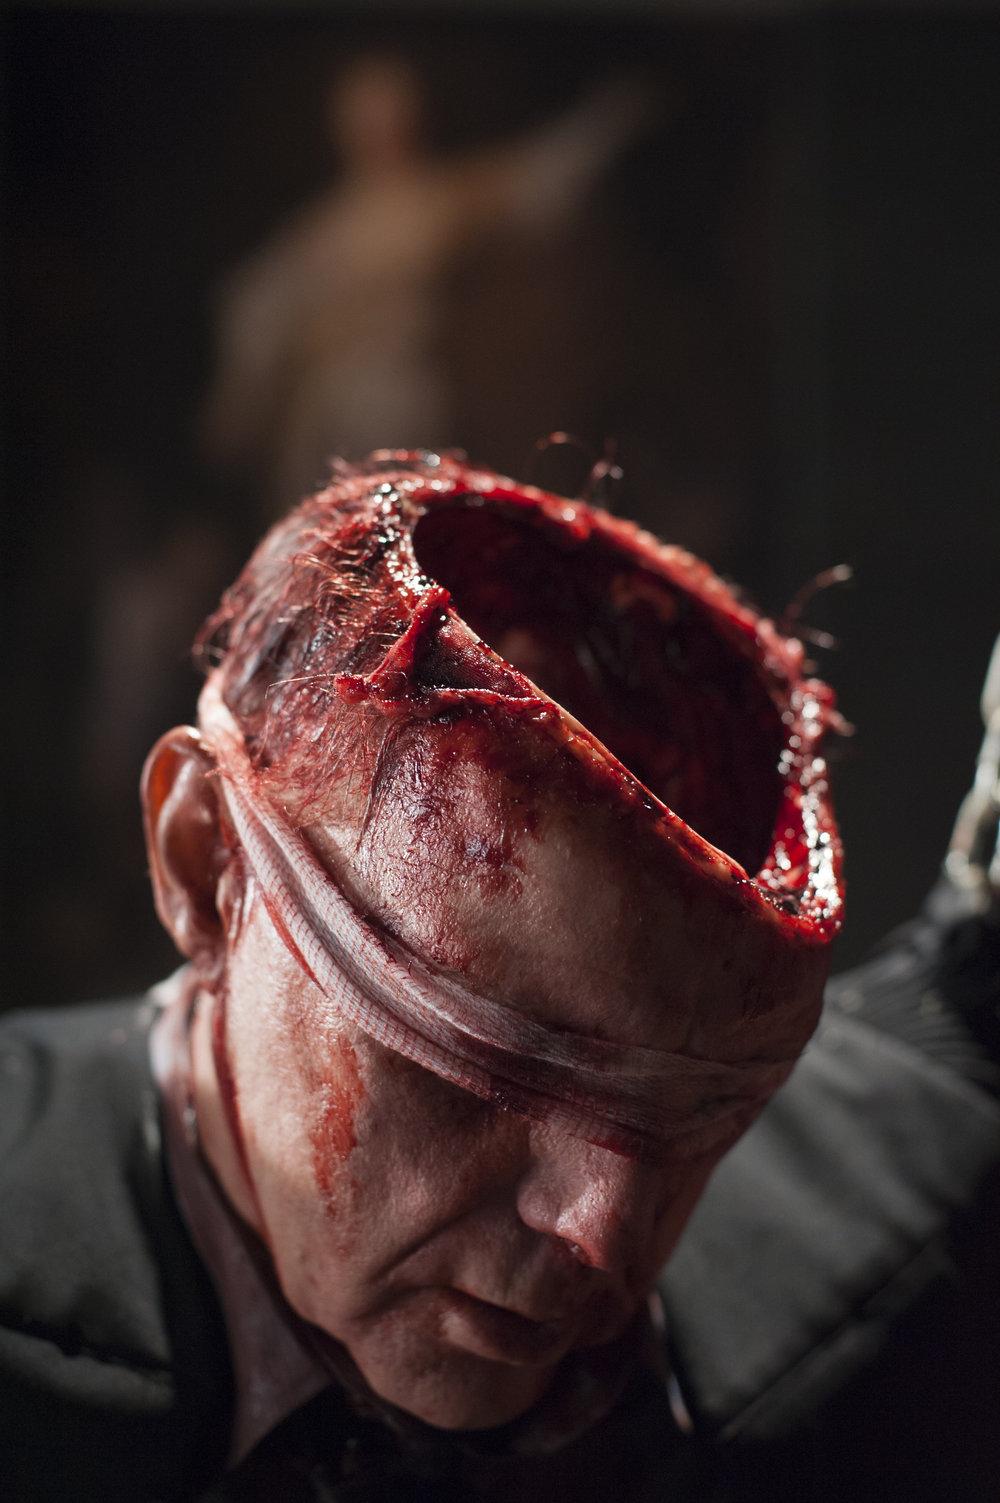 Hannibal S2 007.jpg